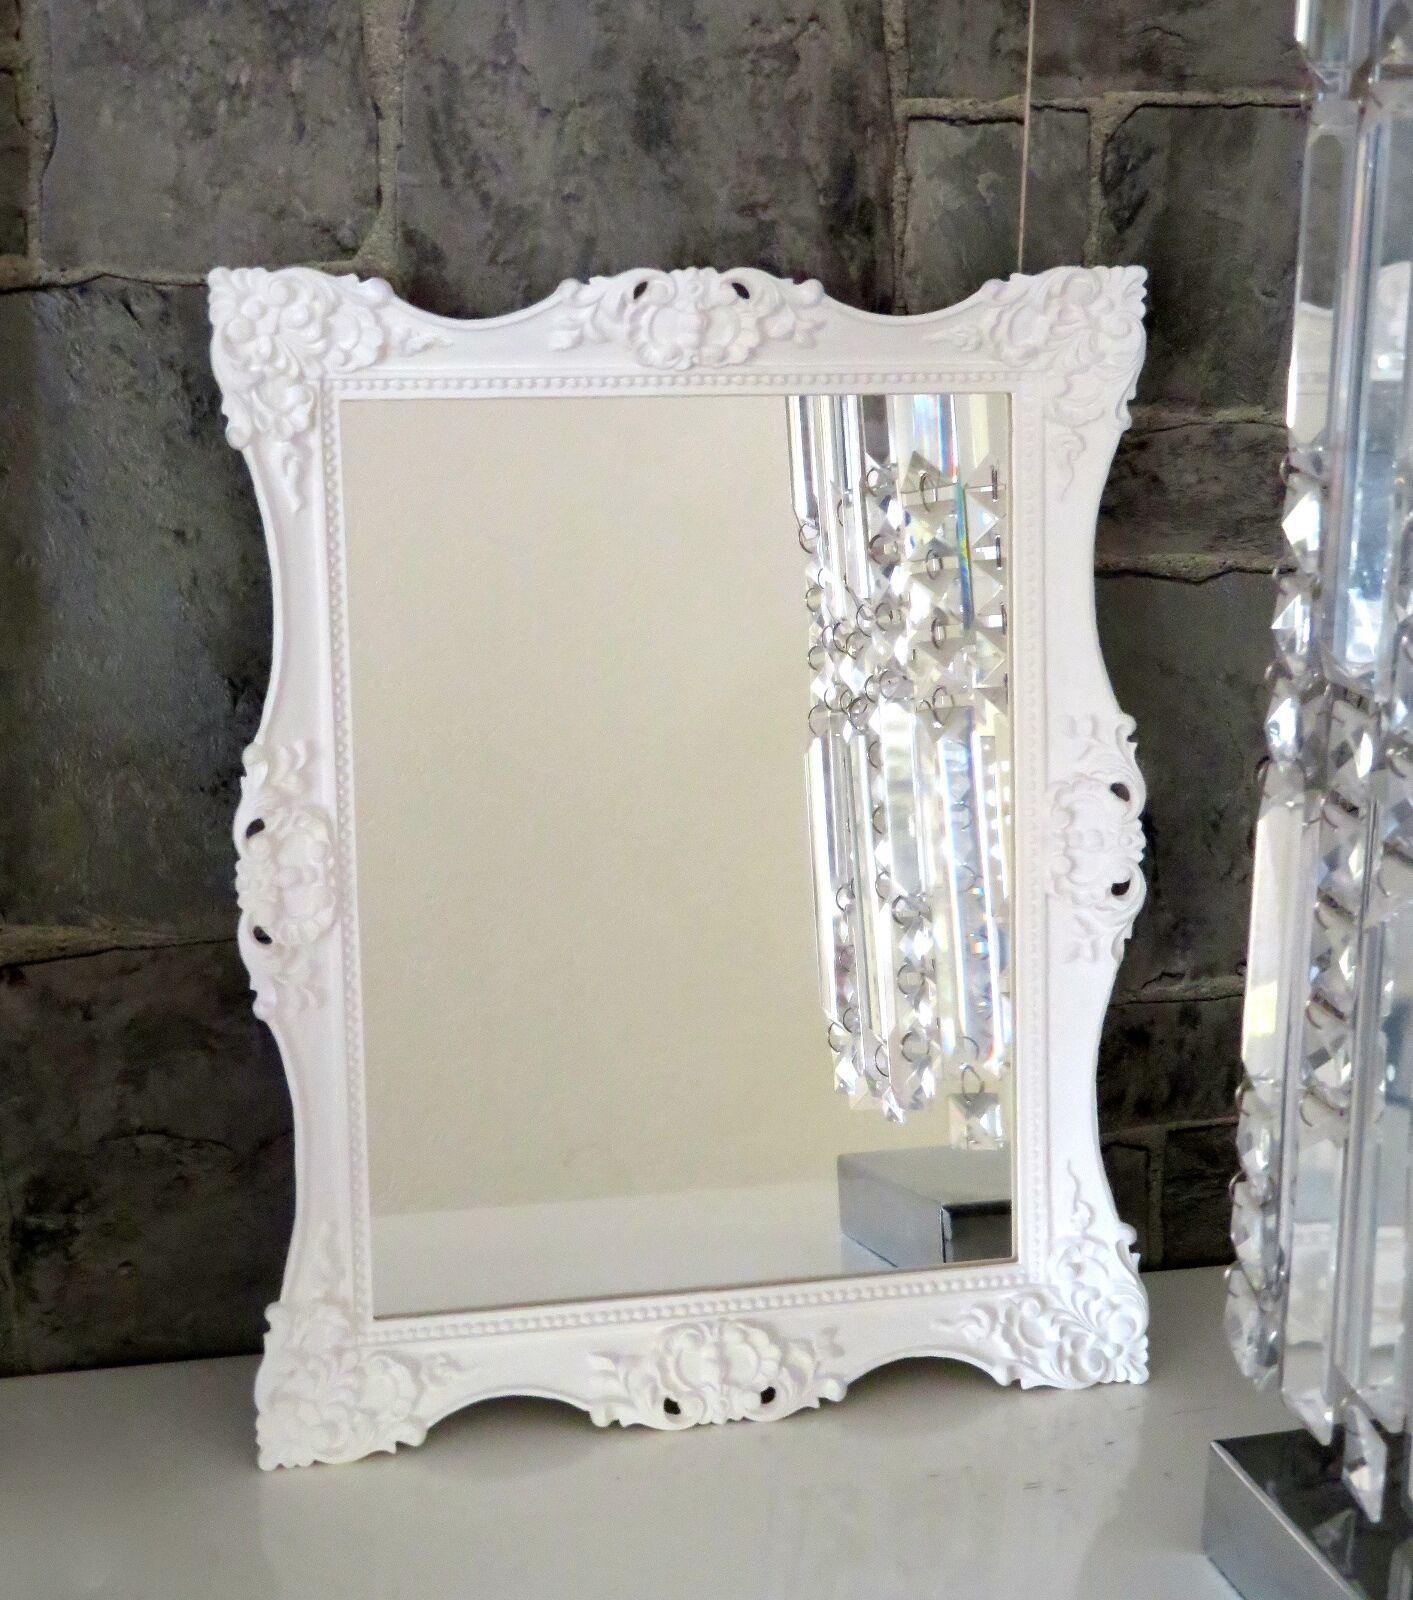 Wandspiegel Barock Weiß Shabby  36x24 Badspiegel Modern Flurspiegel C12M